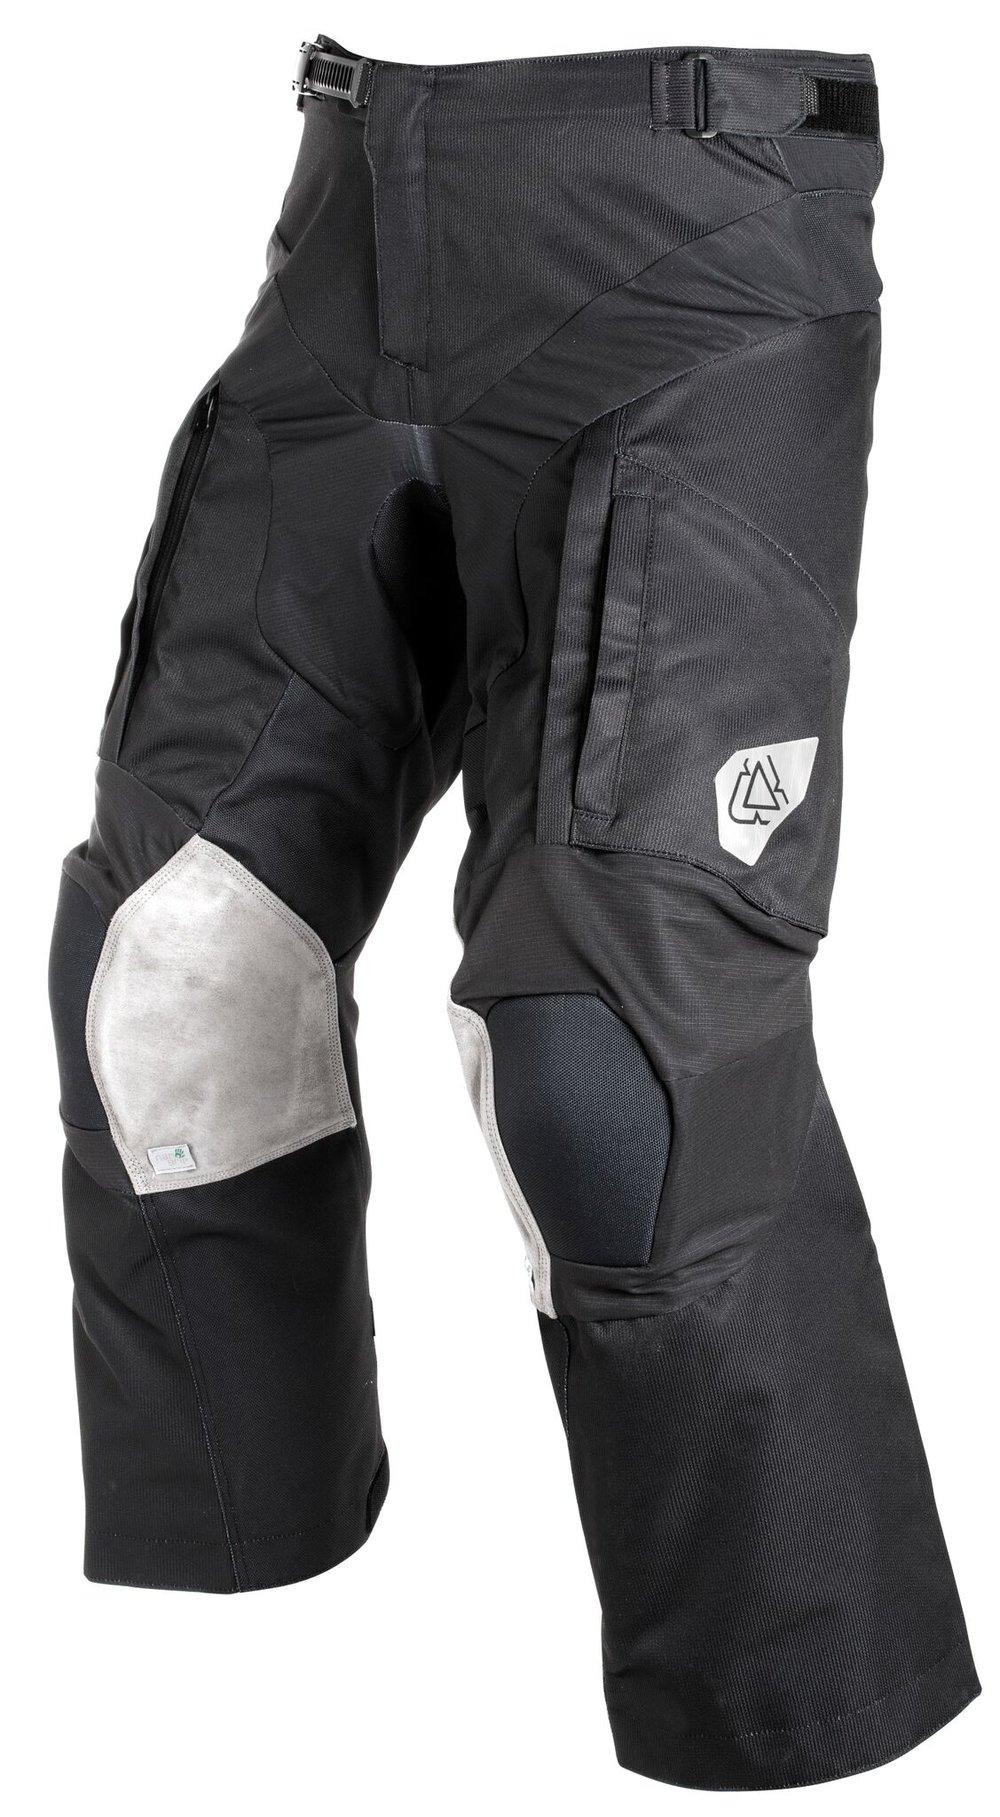 GPX 5.5 Enduro Black Grey Pants 2.JPG